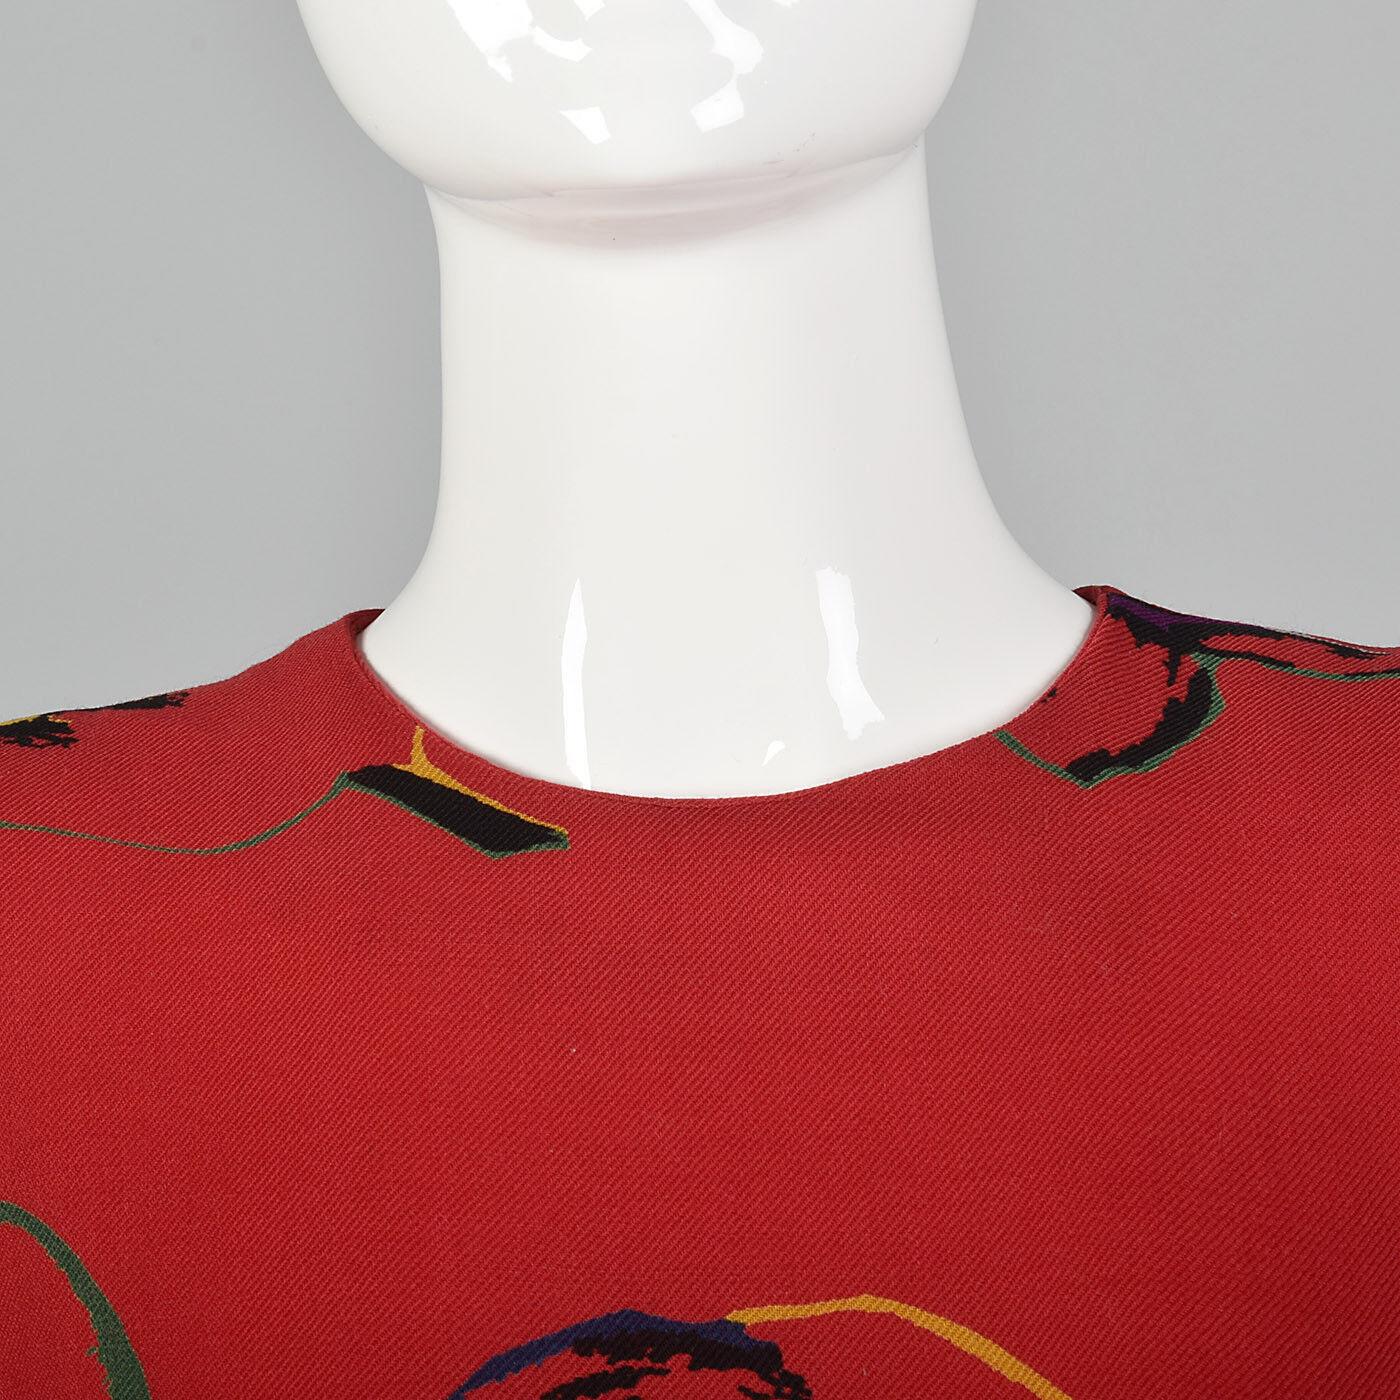 S 1980s Pauline Trigere Long Sleeve Red Dress Dro… - image 6